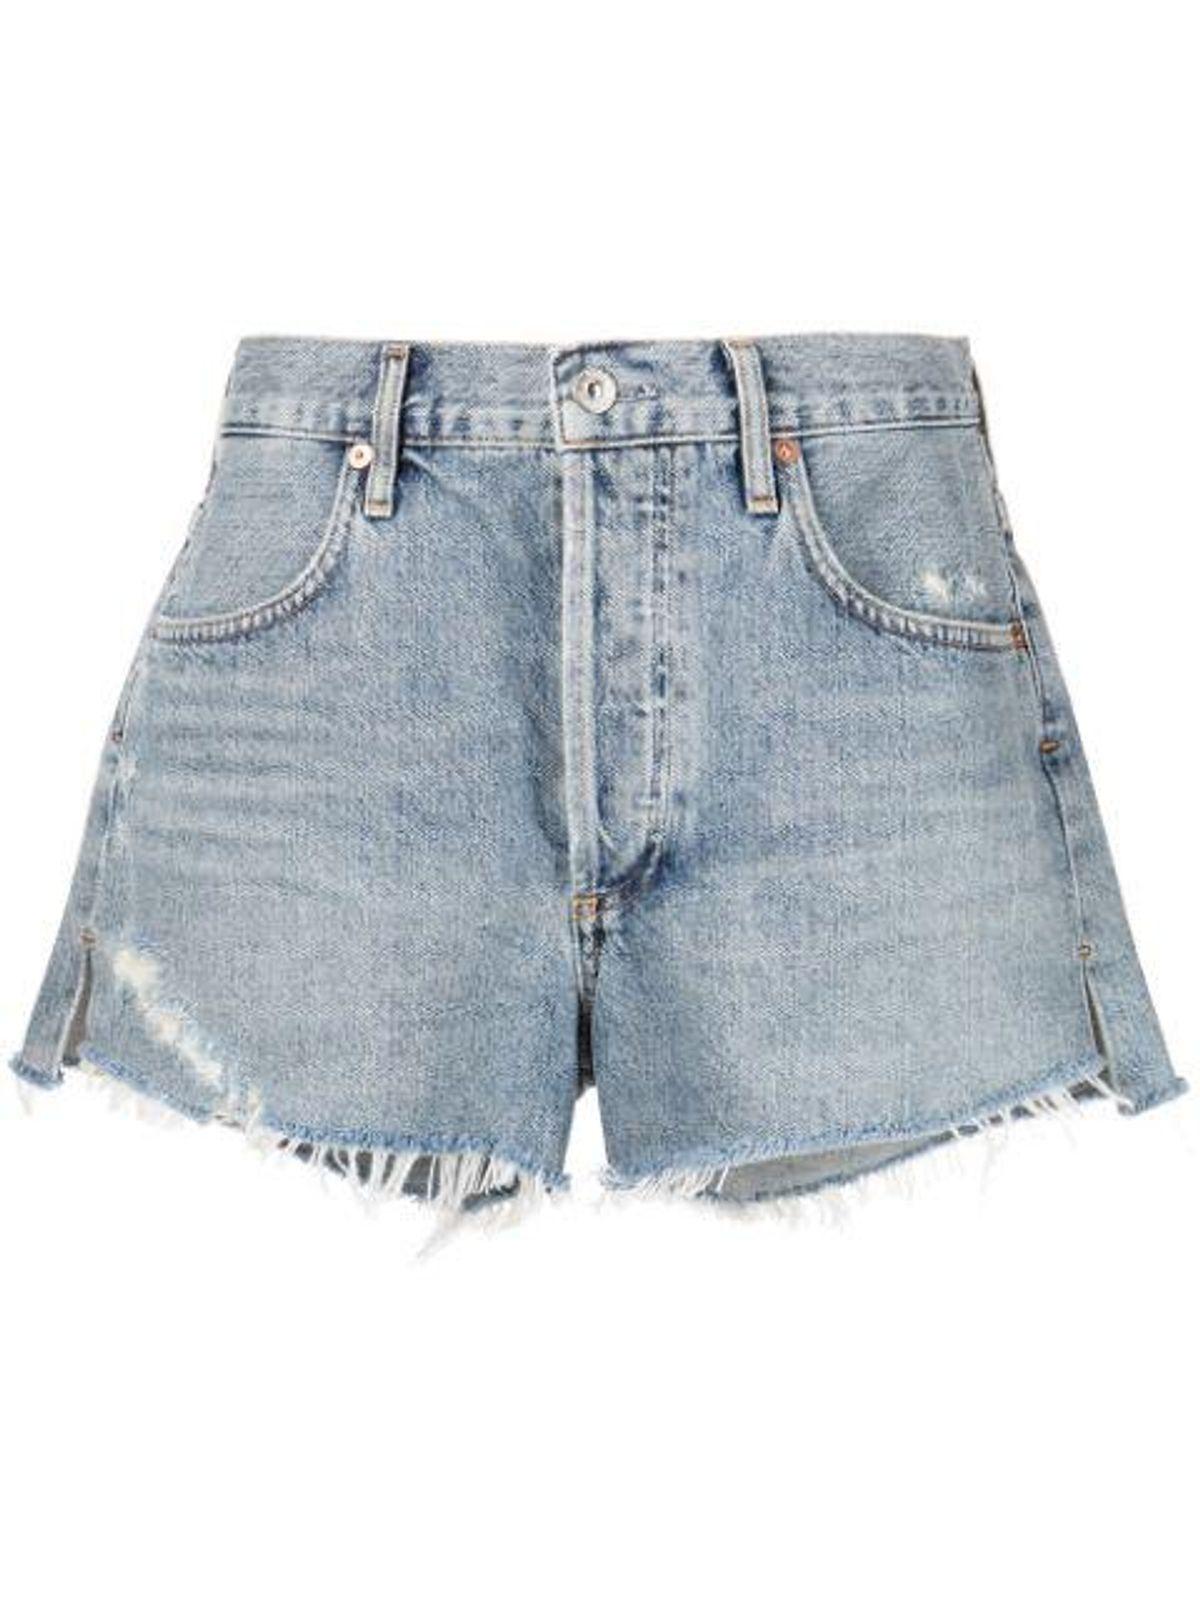 Annabelle Fringed Edge Denim Shorts